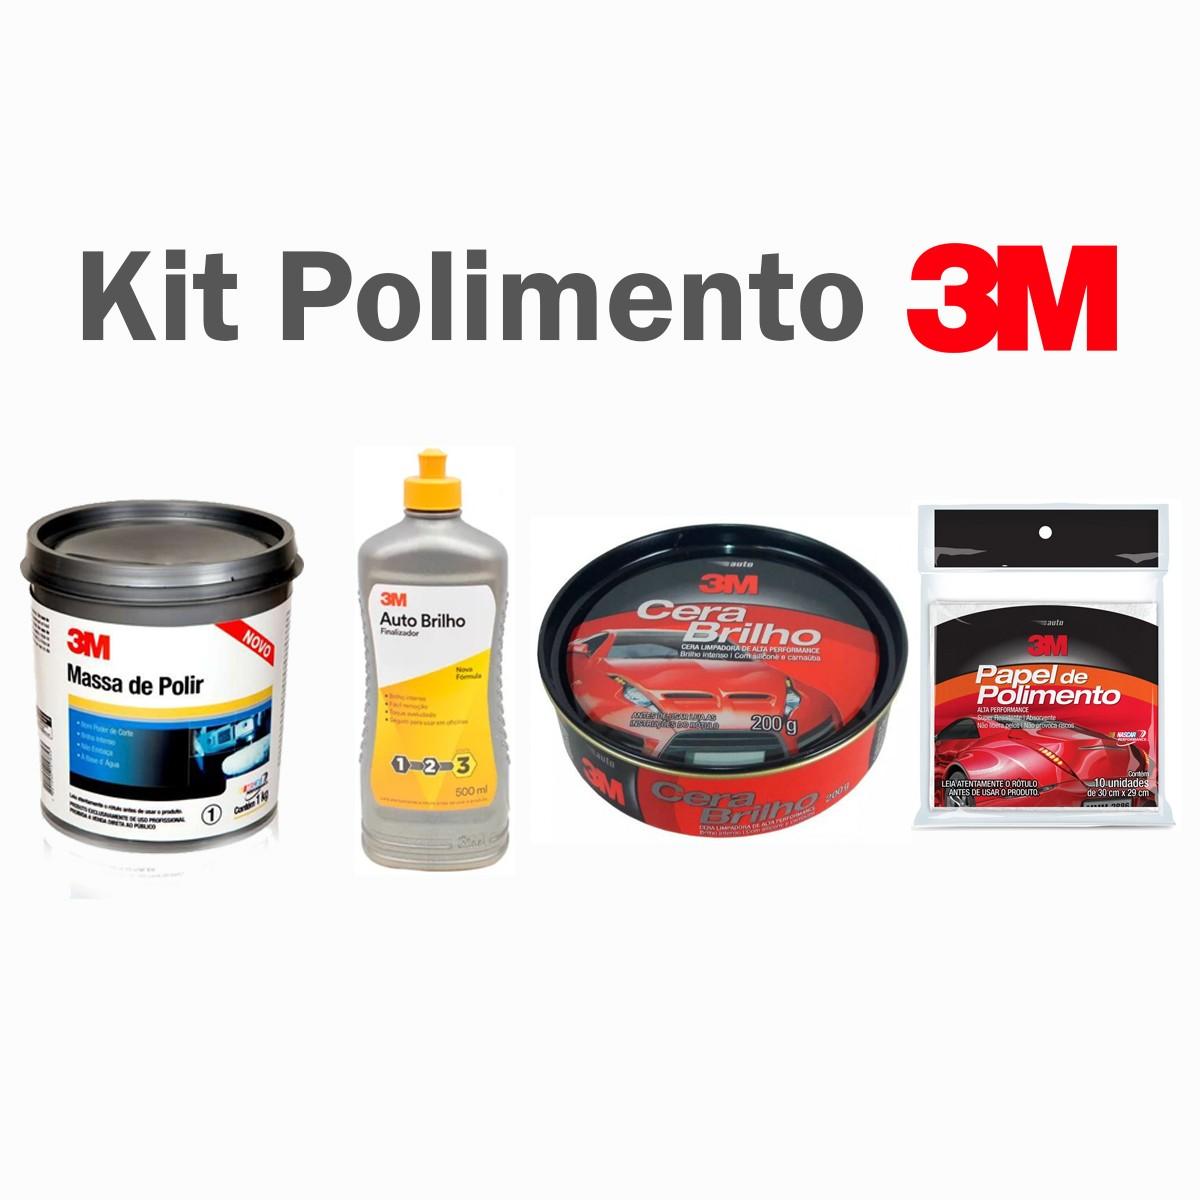 Foto 1 - KIT 3M Massa de Polir + Auto Brilho + Cera Brilho + Papel de Polimentoq